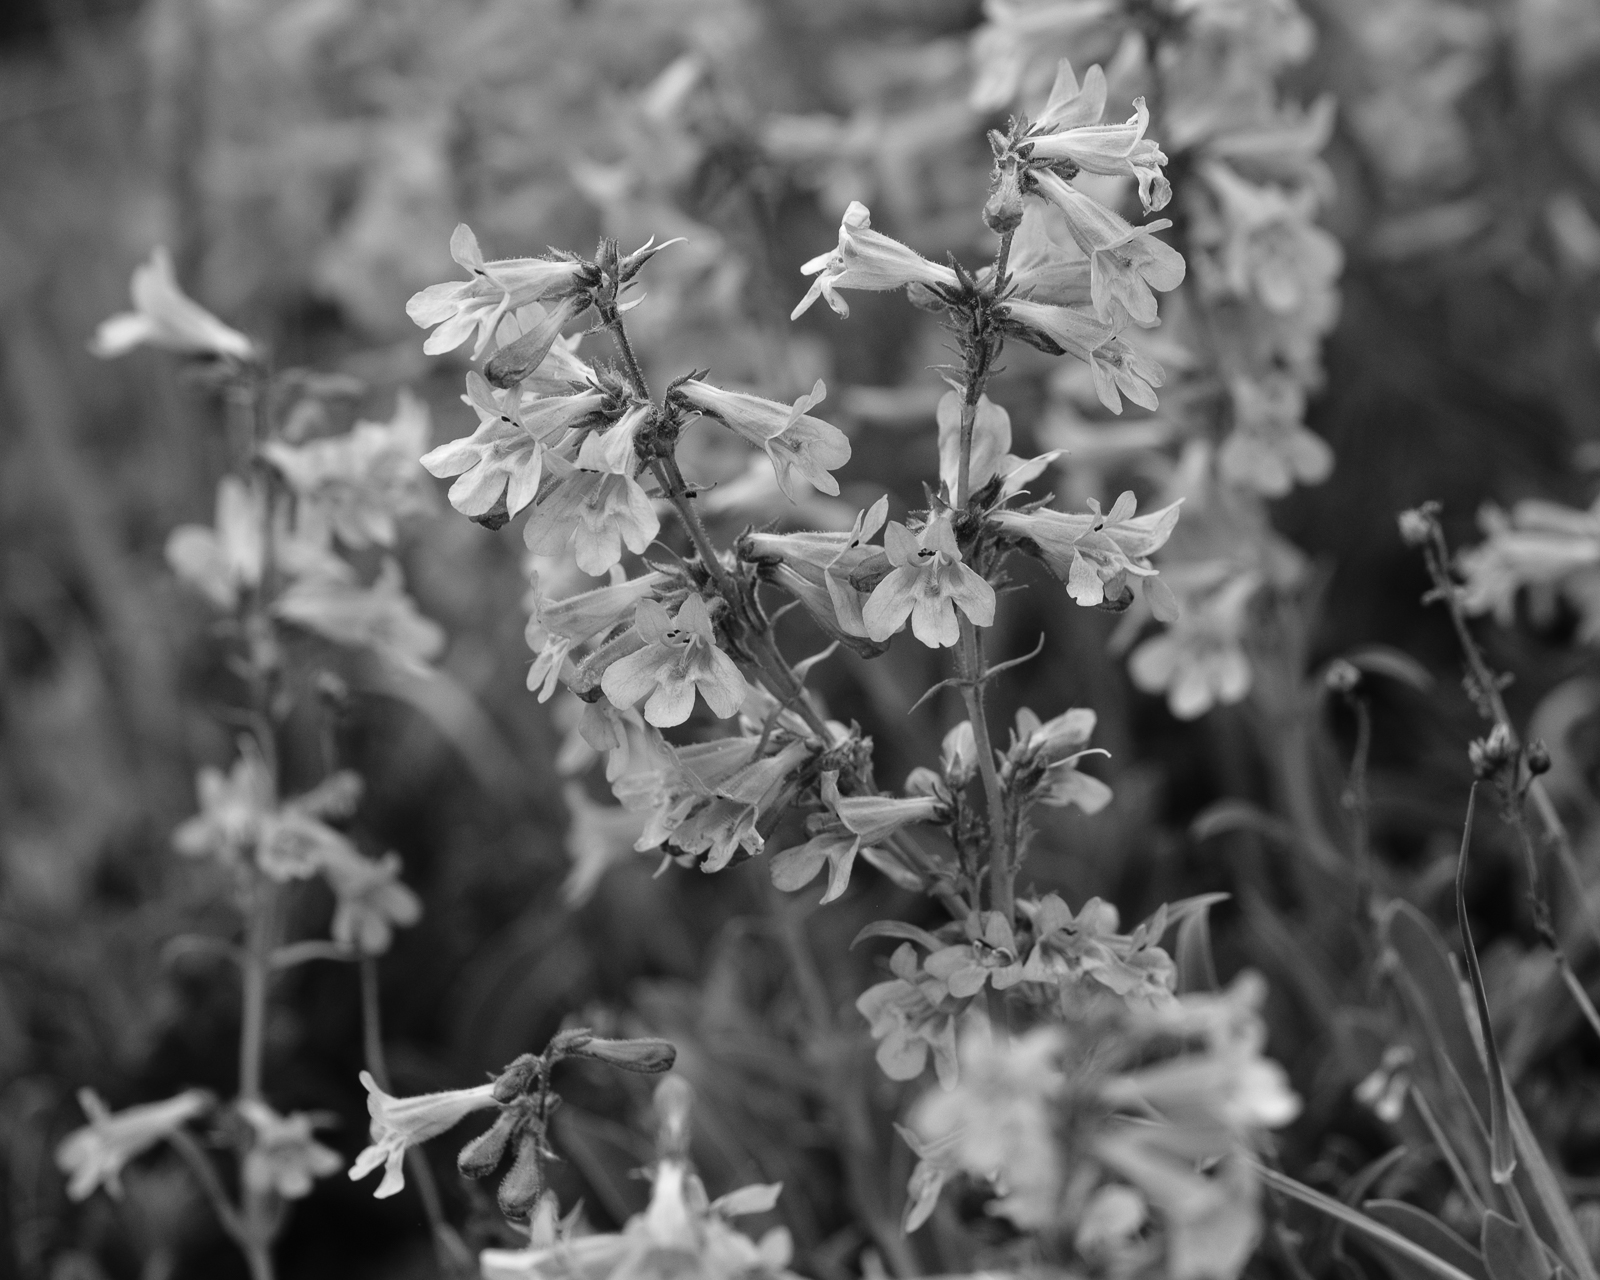 Day 174 - 365 Day B&W Photo Challenge - Blooming Bluebells-  Fujifilm X-T3, XF 50-140mm f/2.8, Acros R Film Simulation